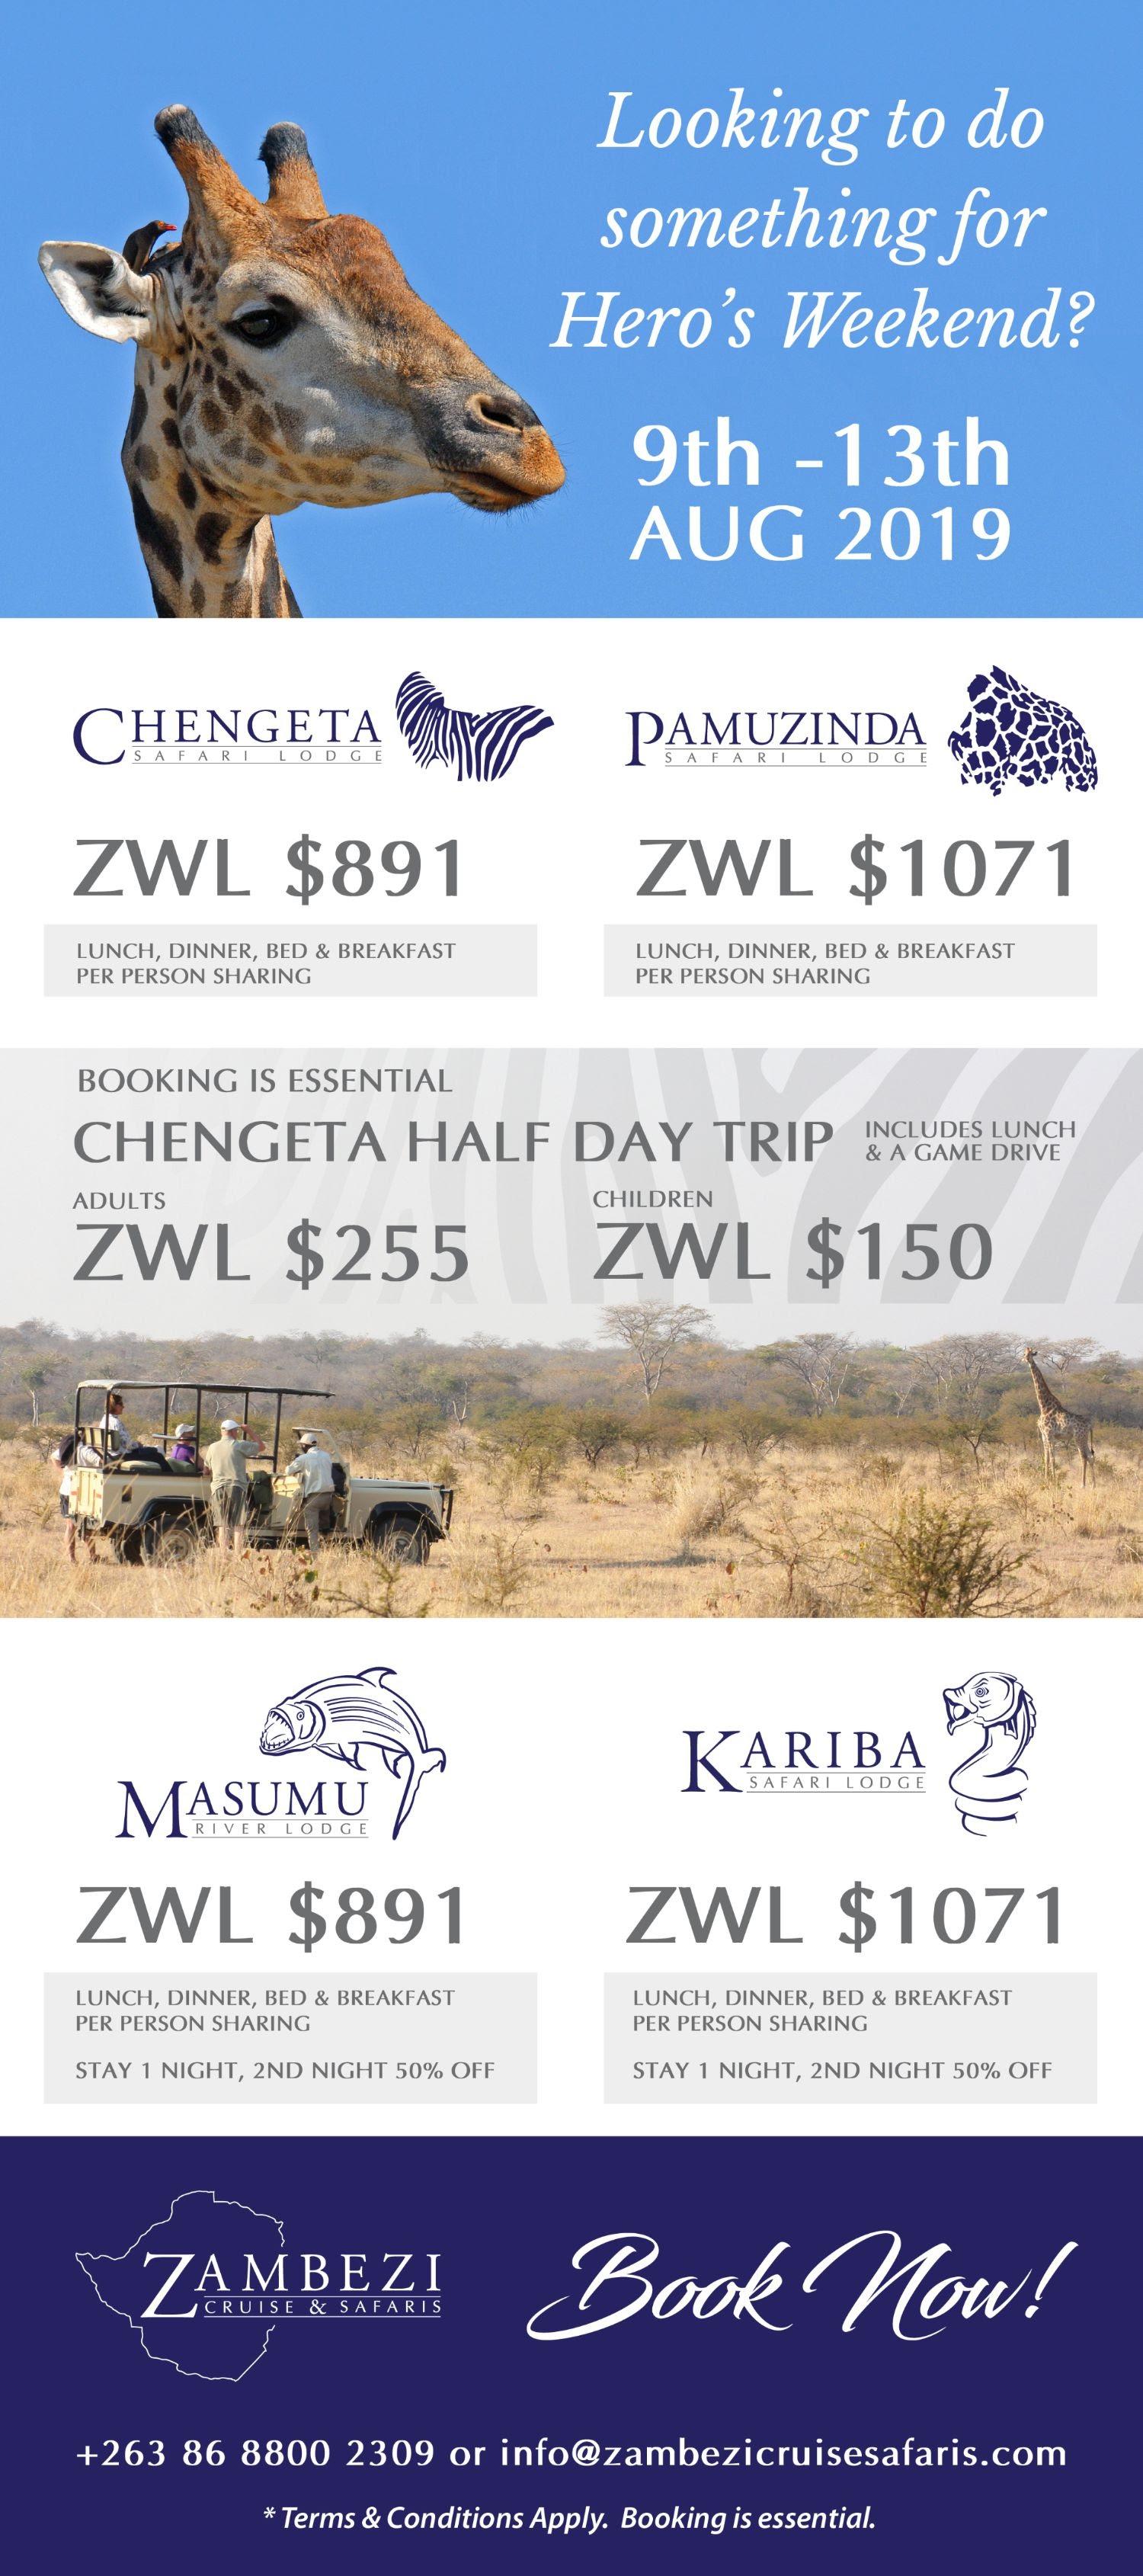 Heroes Weekend Specials Zambezi Cruise Safaris